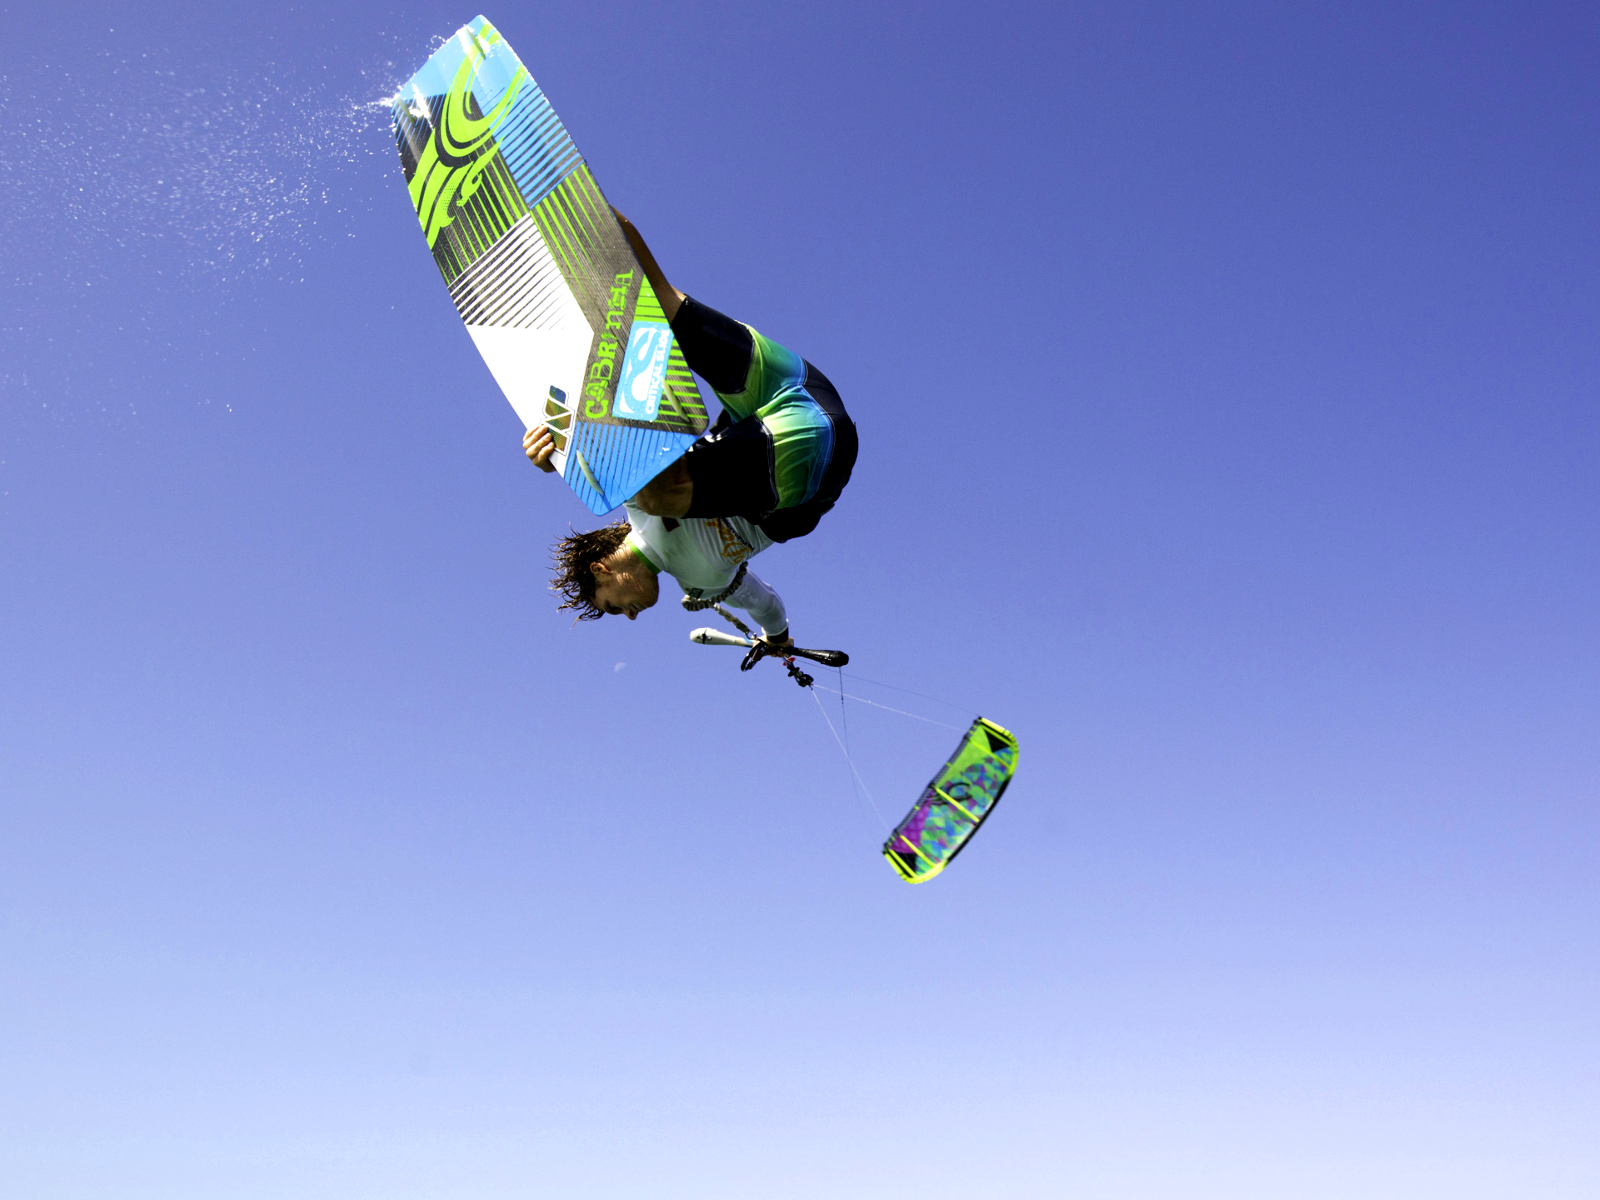 kitesurf wallpaper image - The Cabrinha Chaos kite in action - board grab kitesurfing - in resolution: Standard 4:3 1600 X 1200